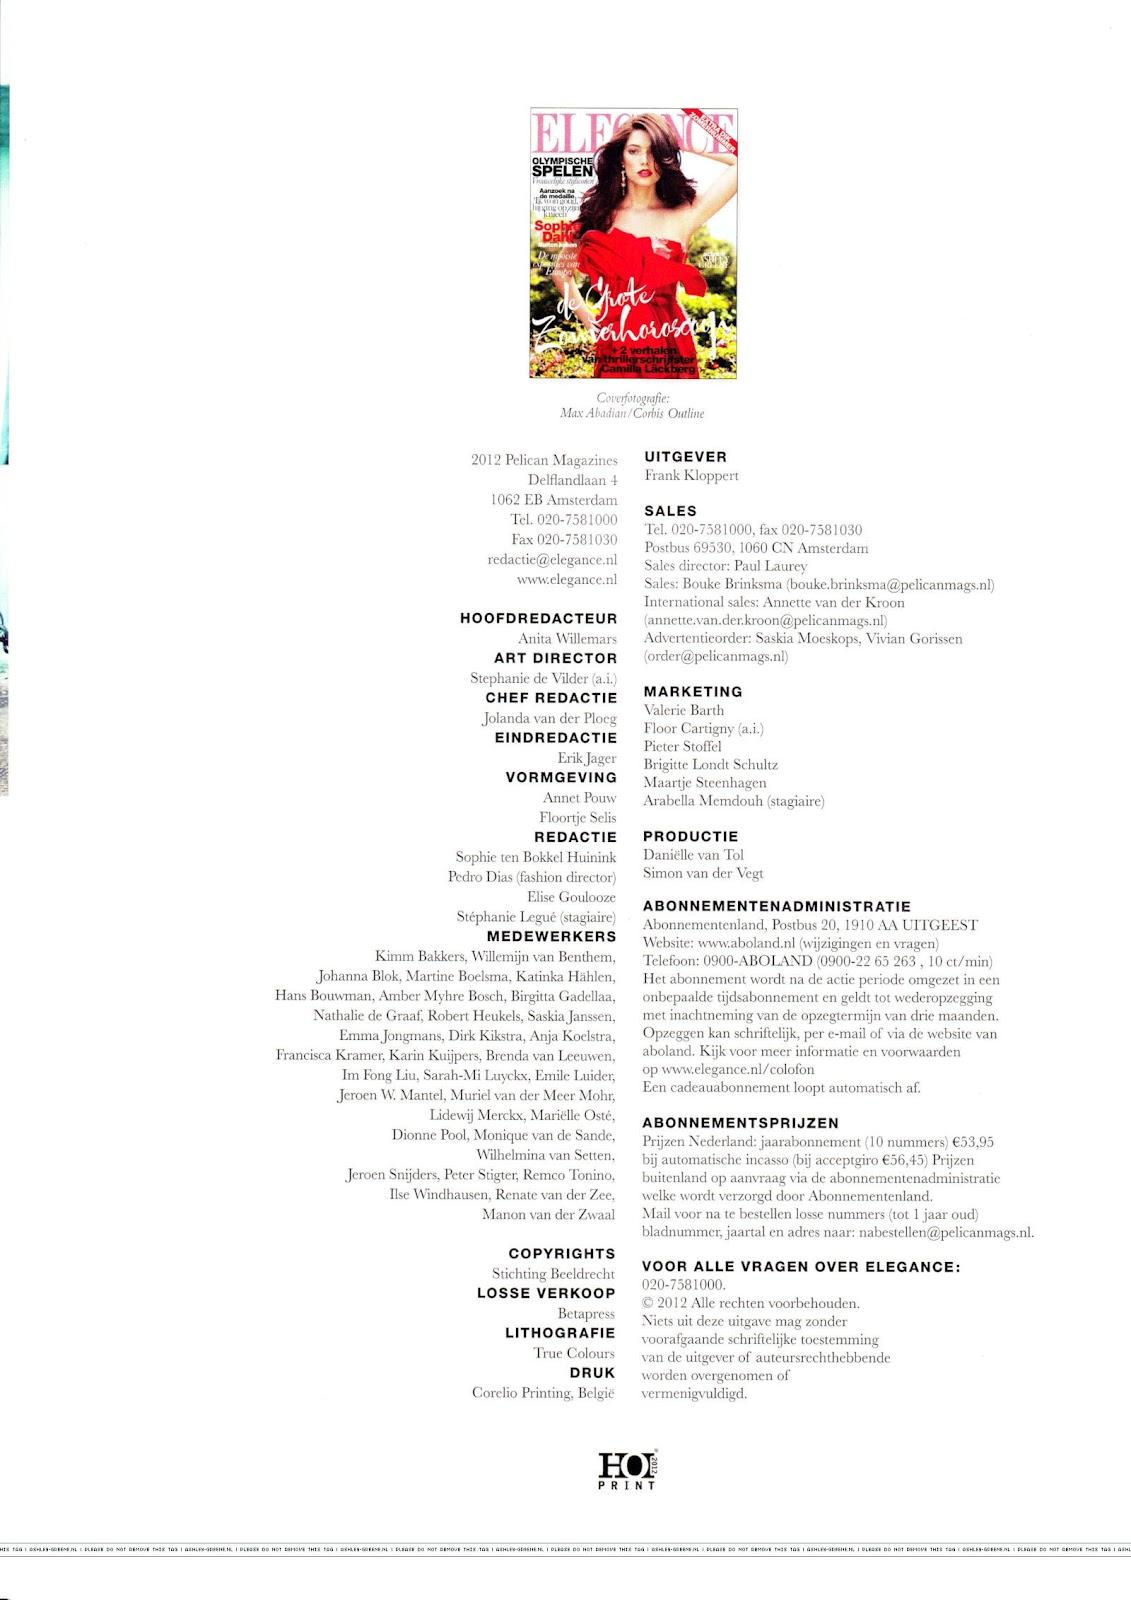 http://1.bp.blogspot.com/-zpxOKvDKikk/UAYJ5wvLN3I/AAAAAAAABkM/mUMvJqLB3d4/s1600/002~8.jpg